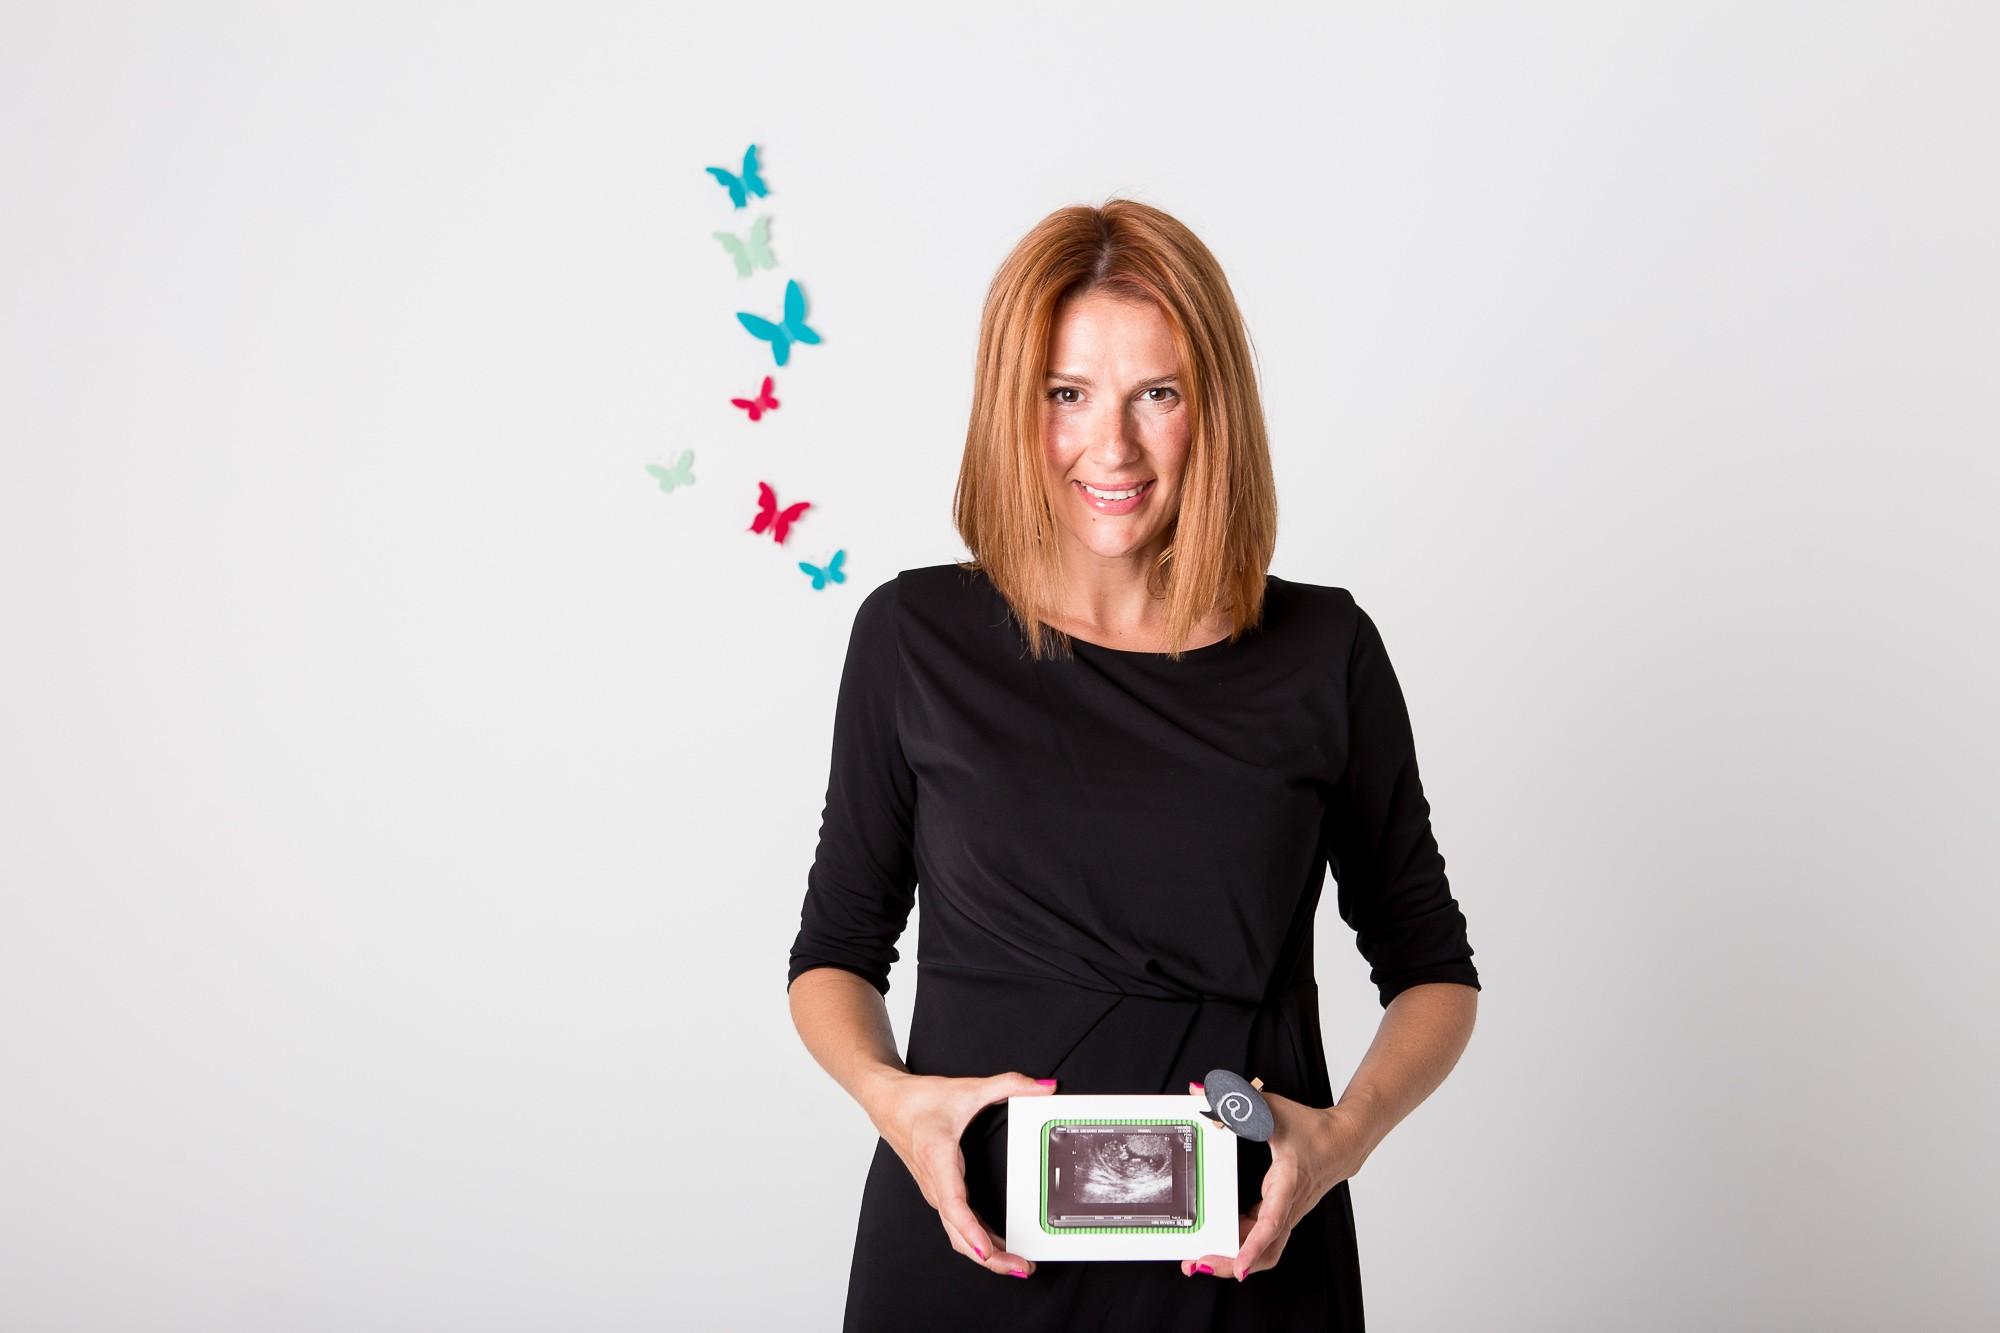 fotografos-embarazo-00038